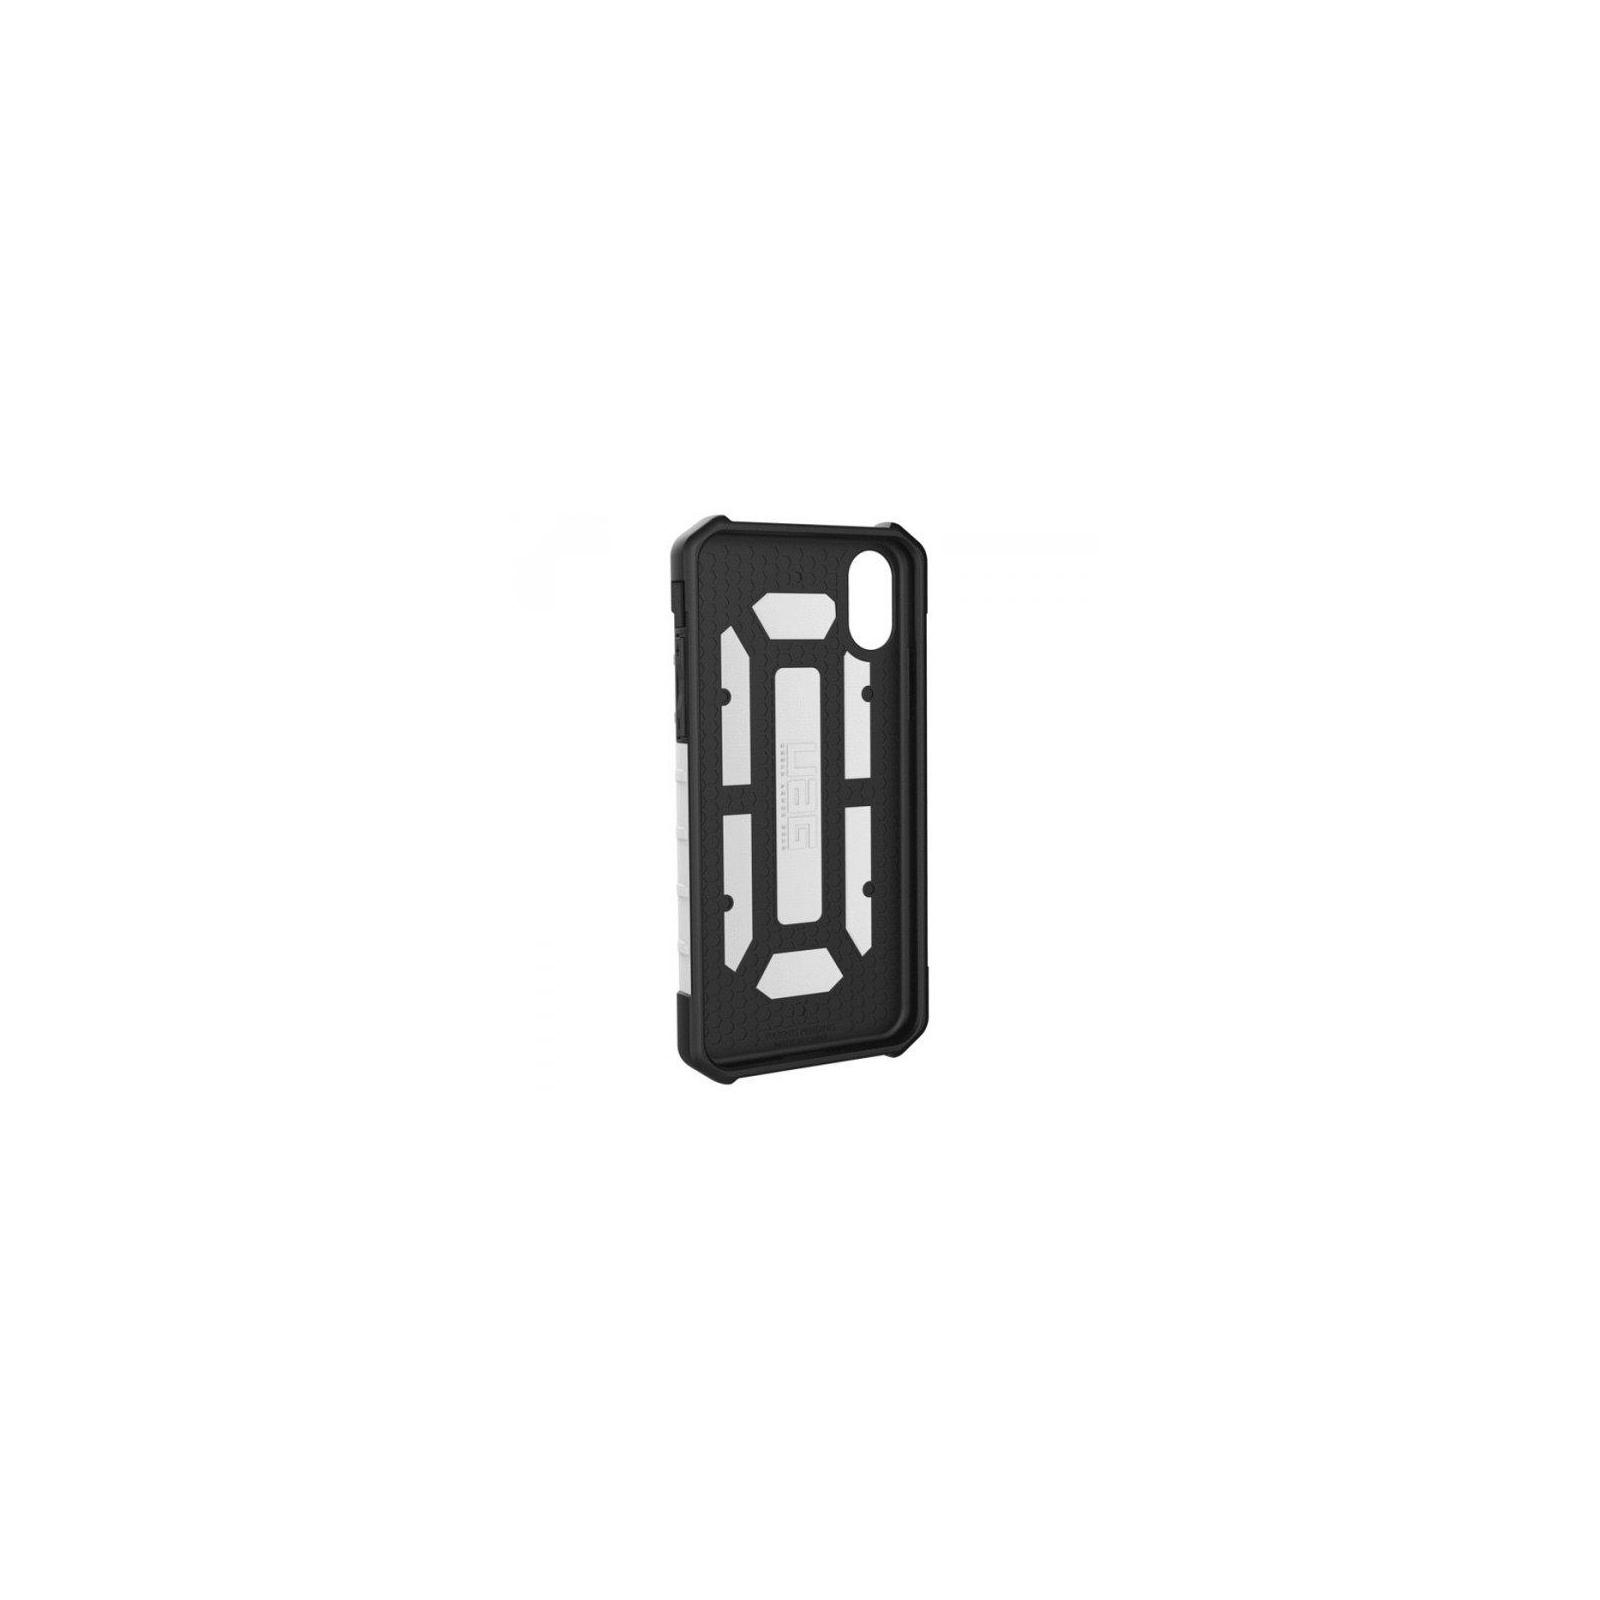 Чехол для моб. телефона UAG iPhone X Pathfinder Camo Gray/White (IPHX-A-WC) изображение 3